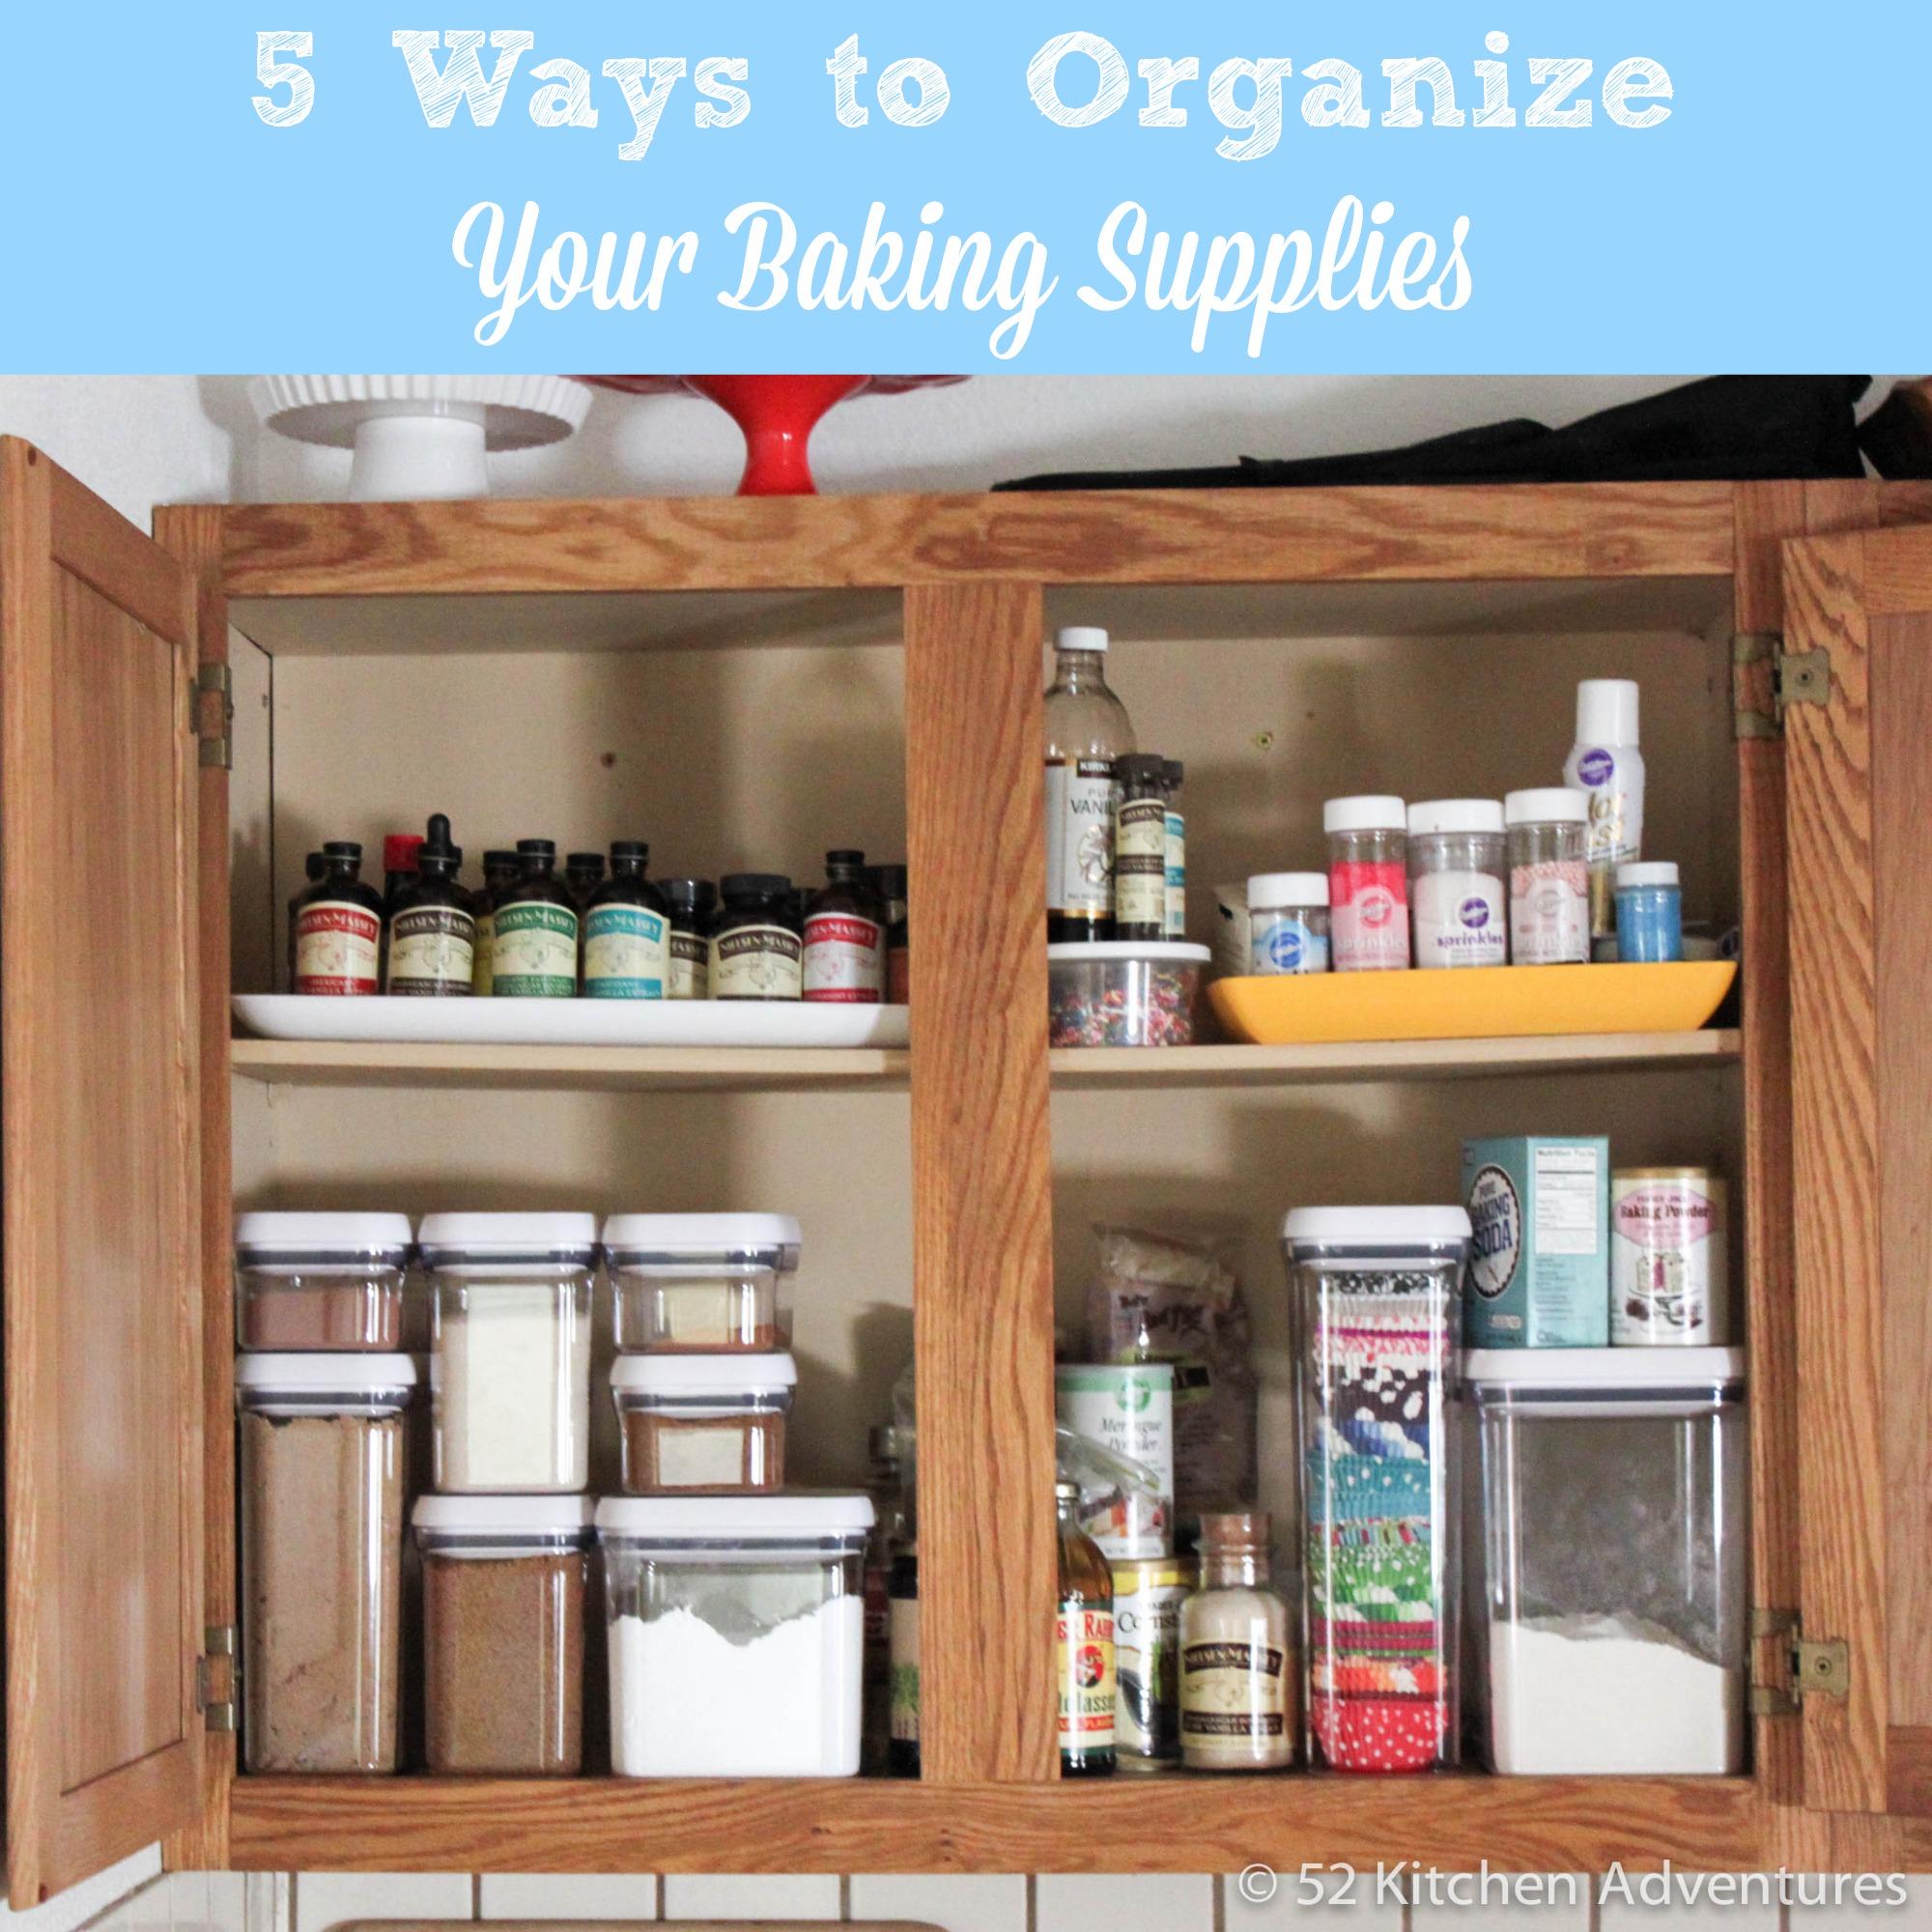 5 Ways to Organize Your Baking Supplies